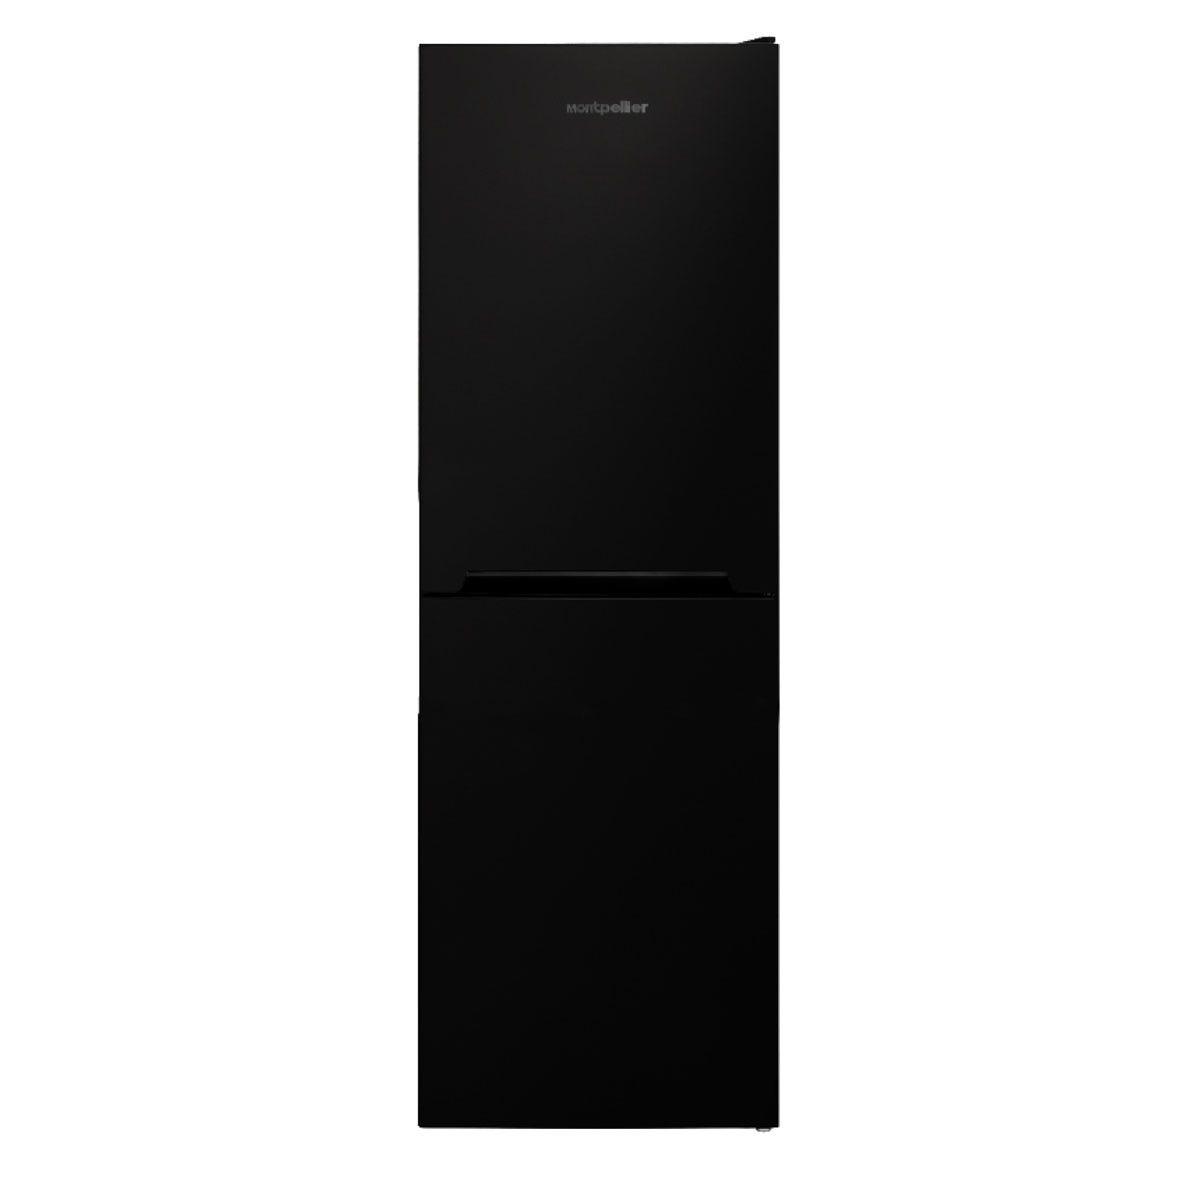 Montpellier MFF165K 54cm 50/50 Frost Free Fridge Freezer - Black